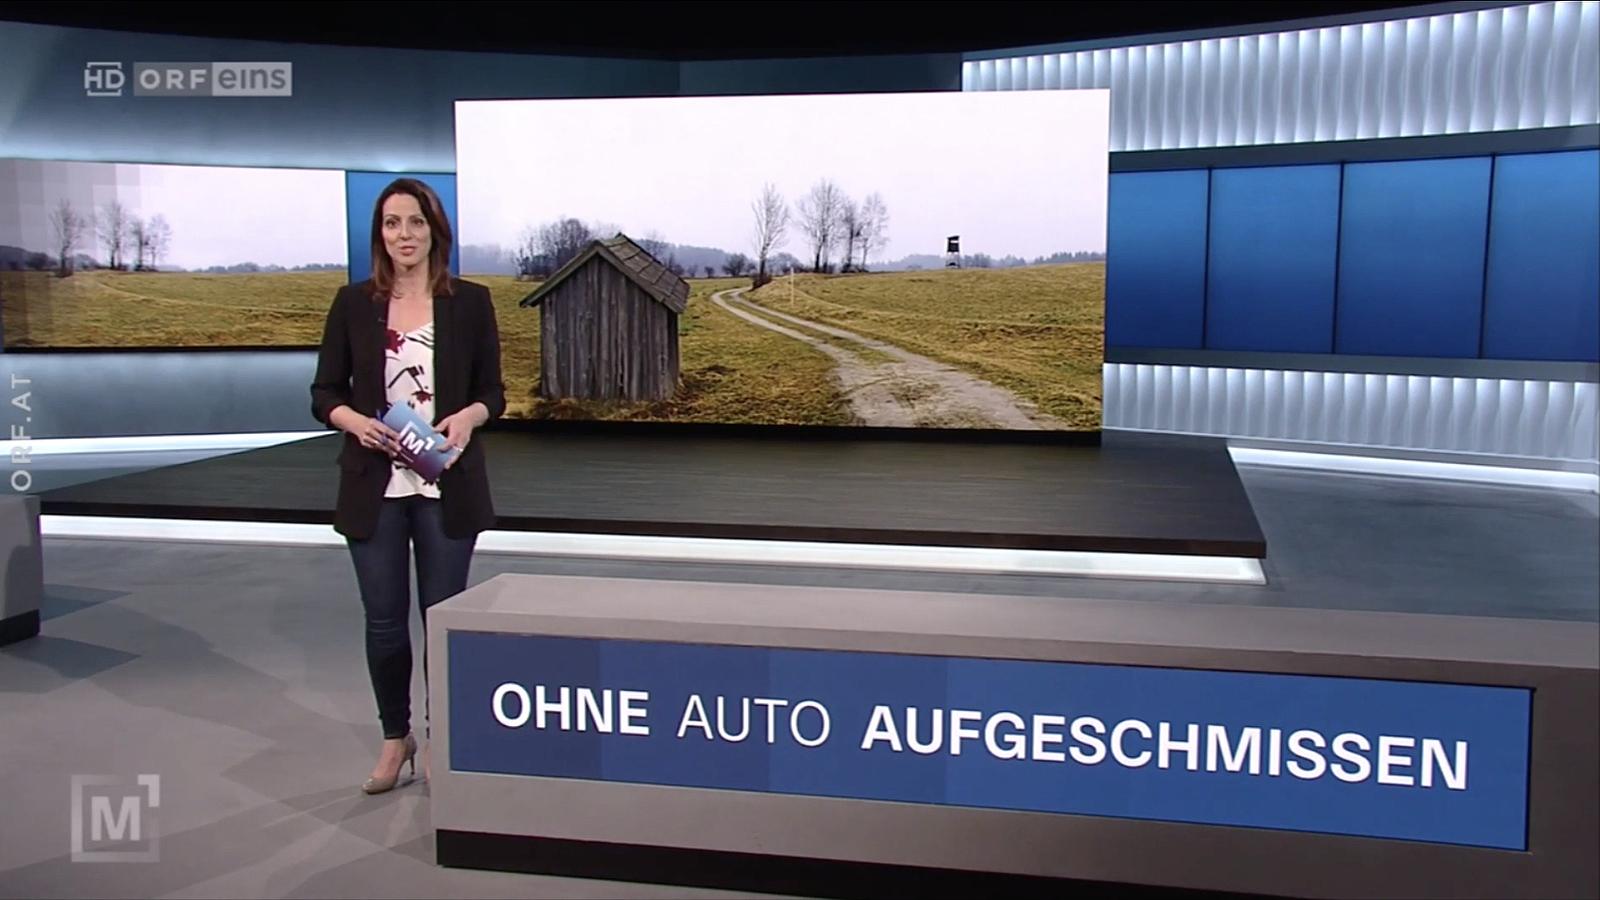 NCS_ORF-Veech-2019_0013